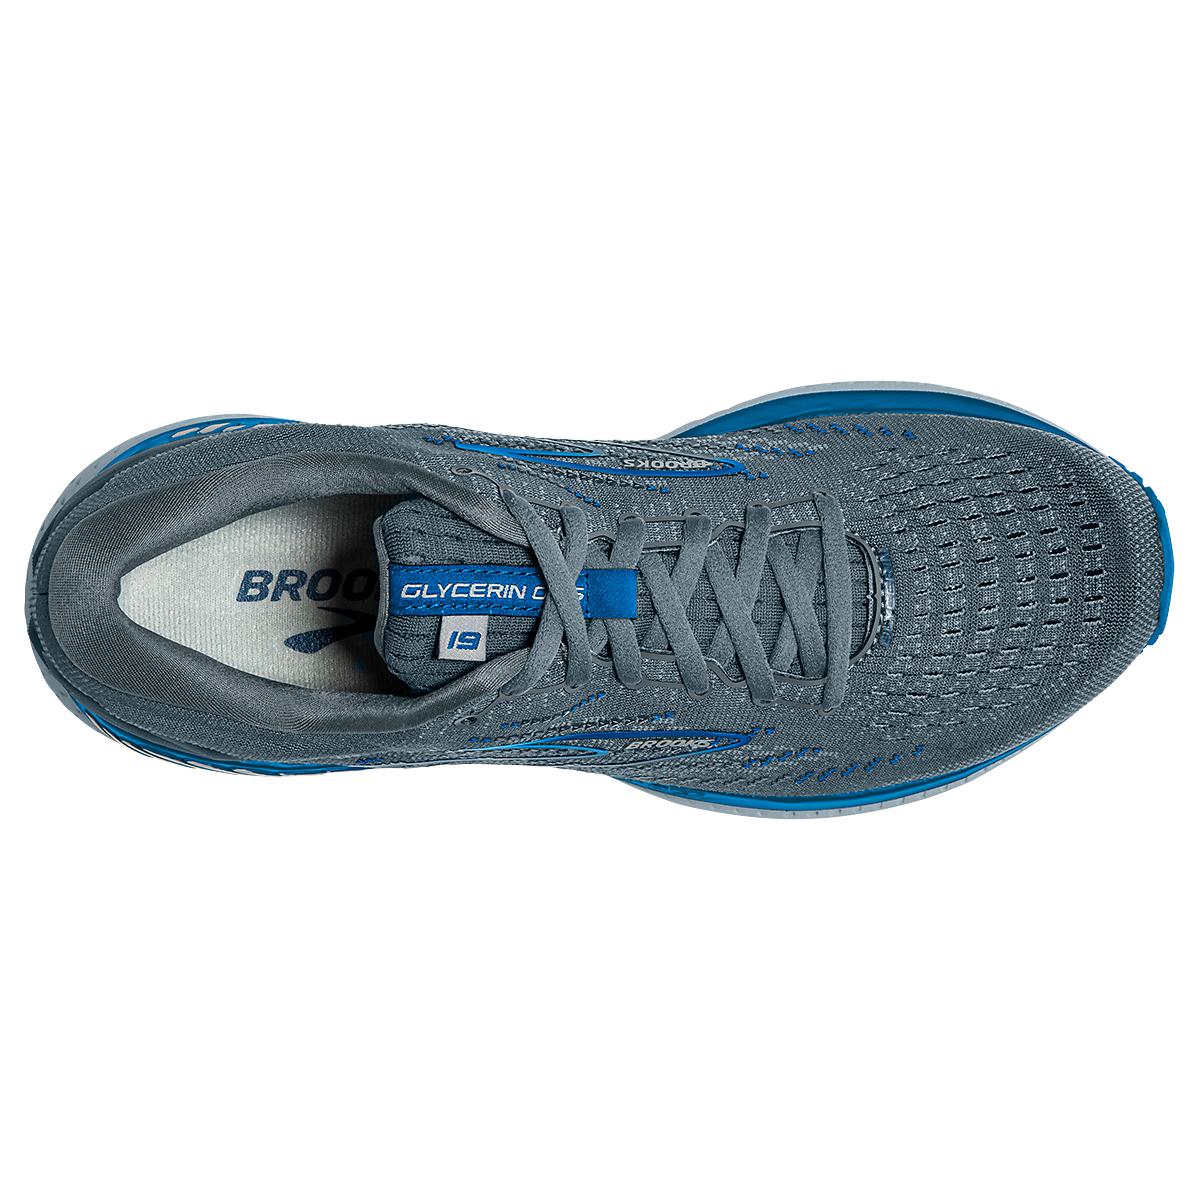 Men's Brooks Glycerin GTS 19 Running Shoe - Color: Quarry/Grey/Dark - Size: 7 - Width: Wide, Quarry/Grey/Dark, large, image 2